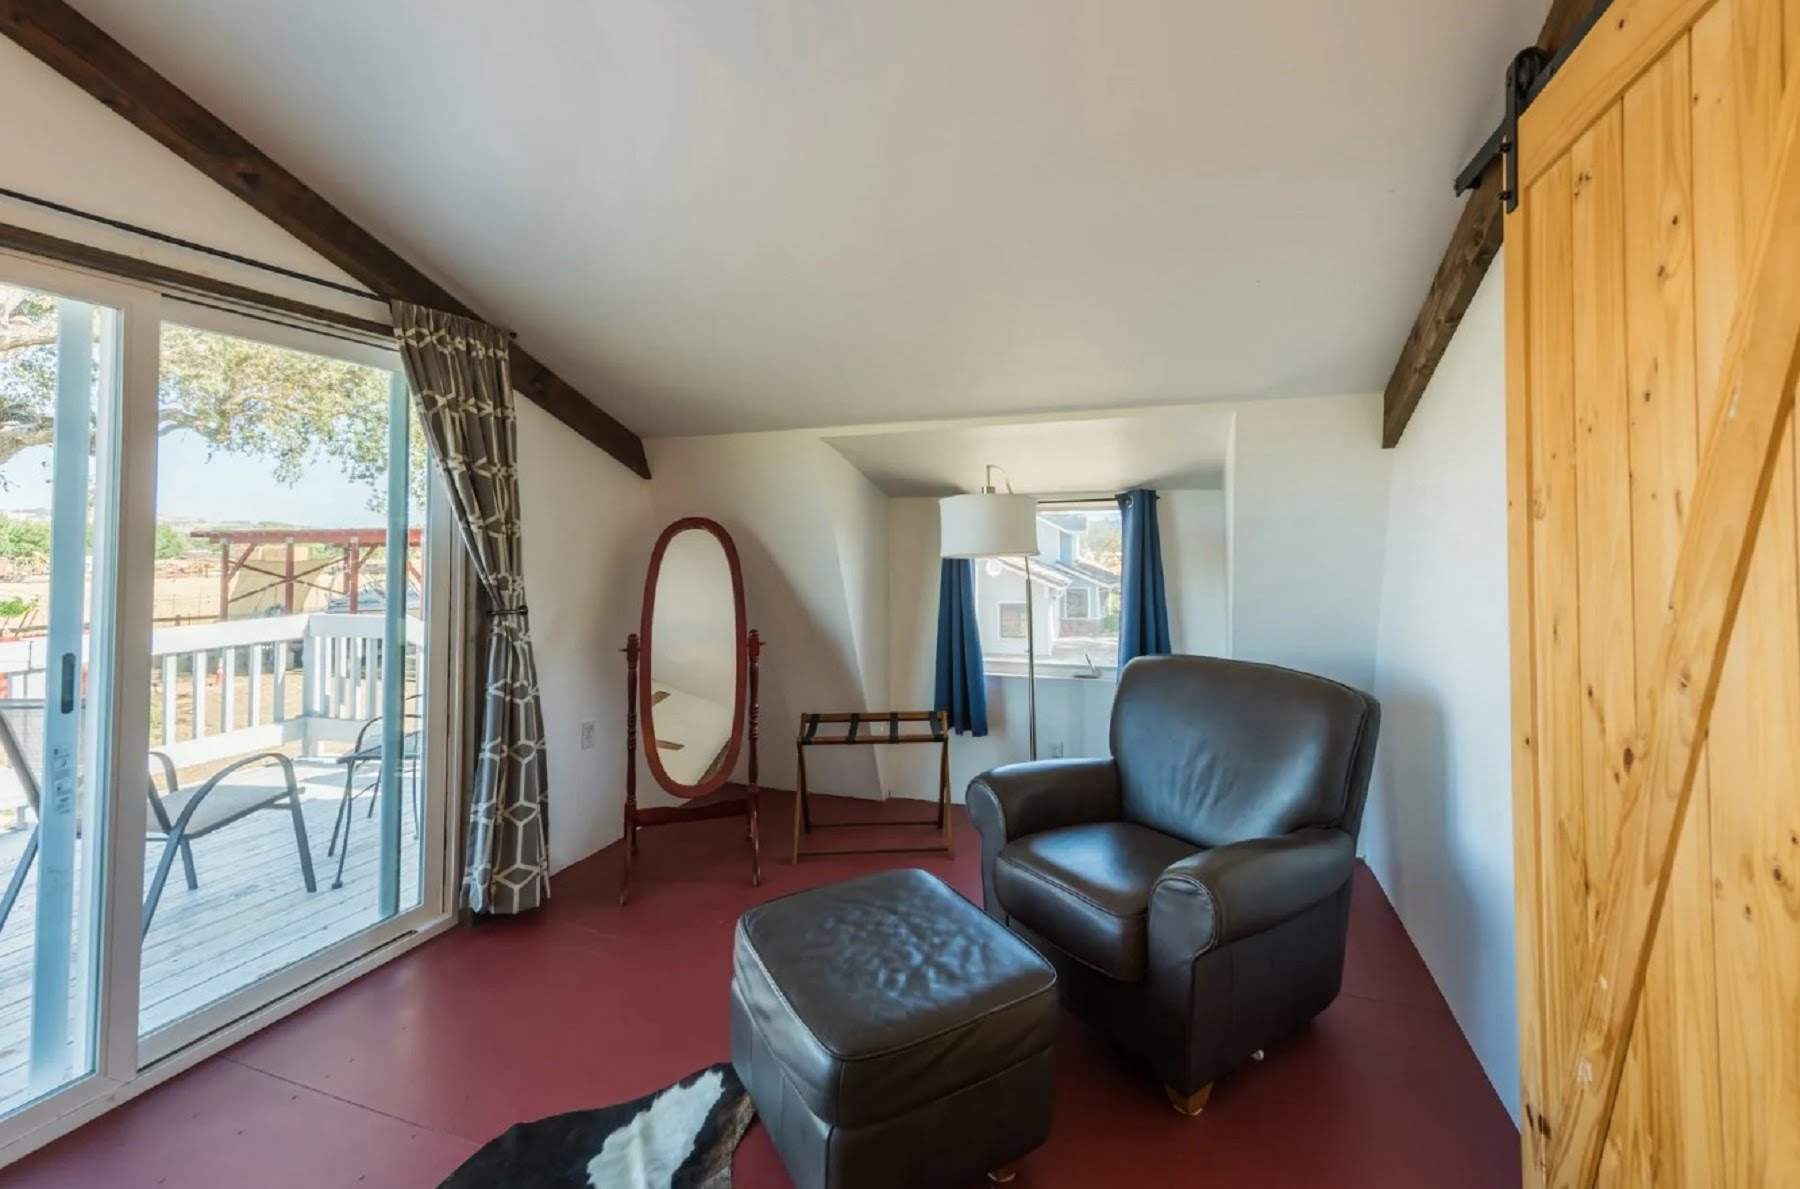 Rancho Da Hamilton - Loft bedroom sitting area